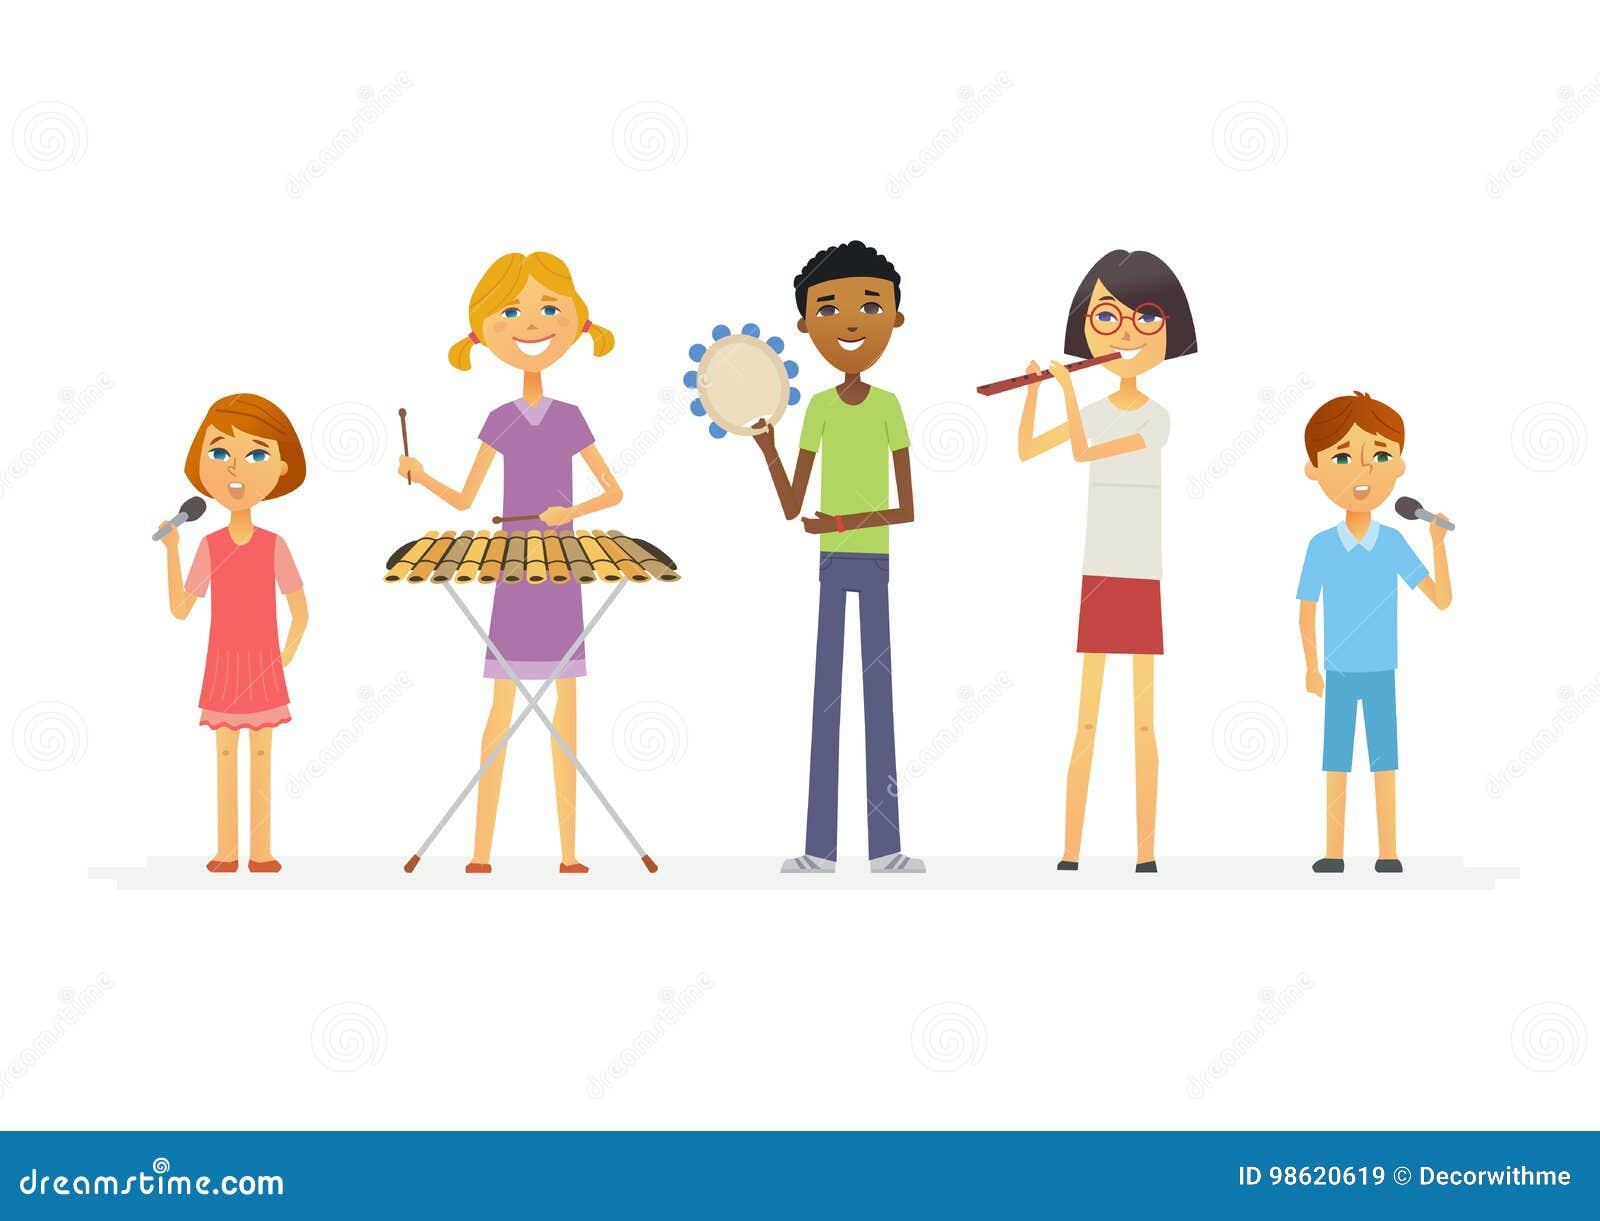 Happy Schoolchildren Playing Music - Cartoon People Characters